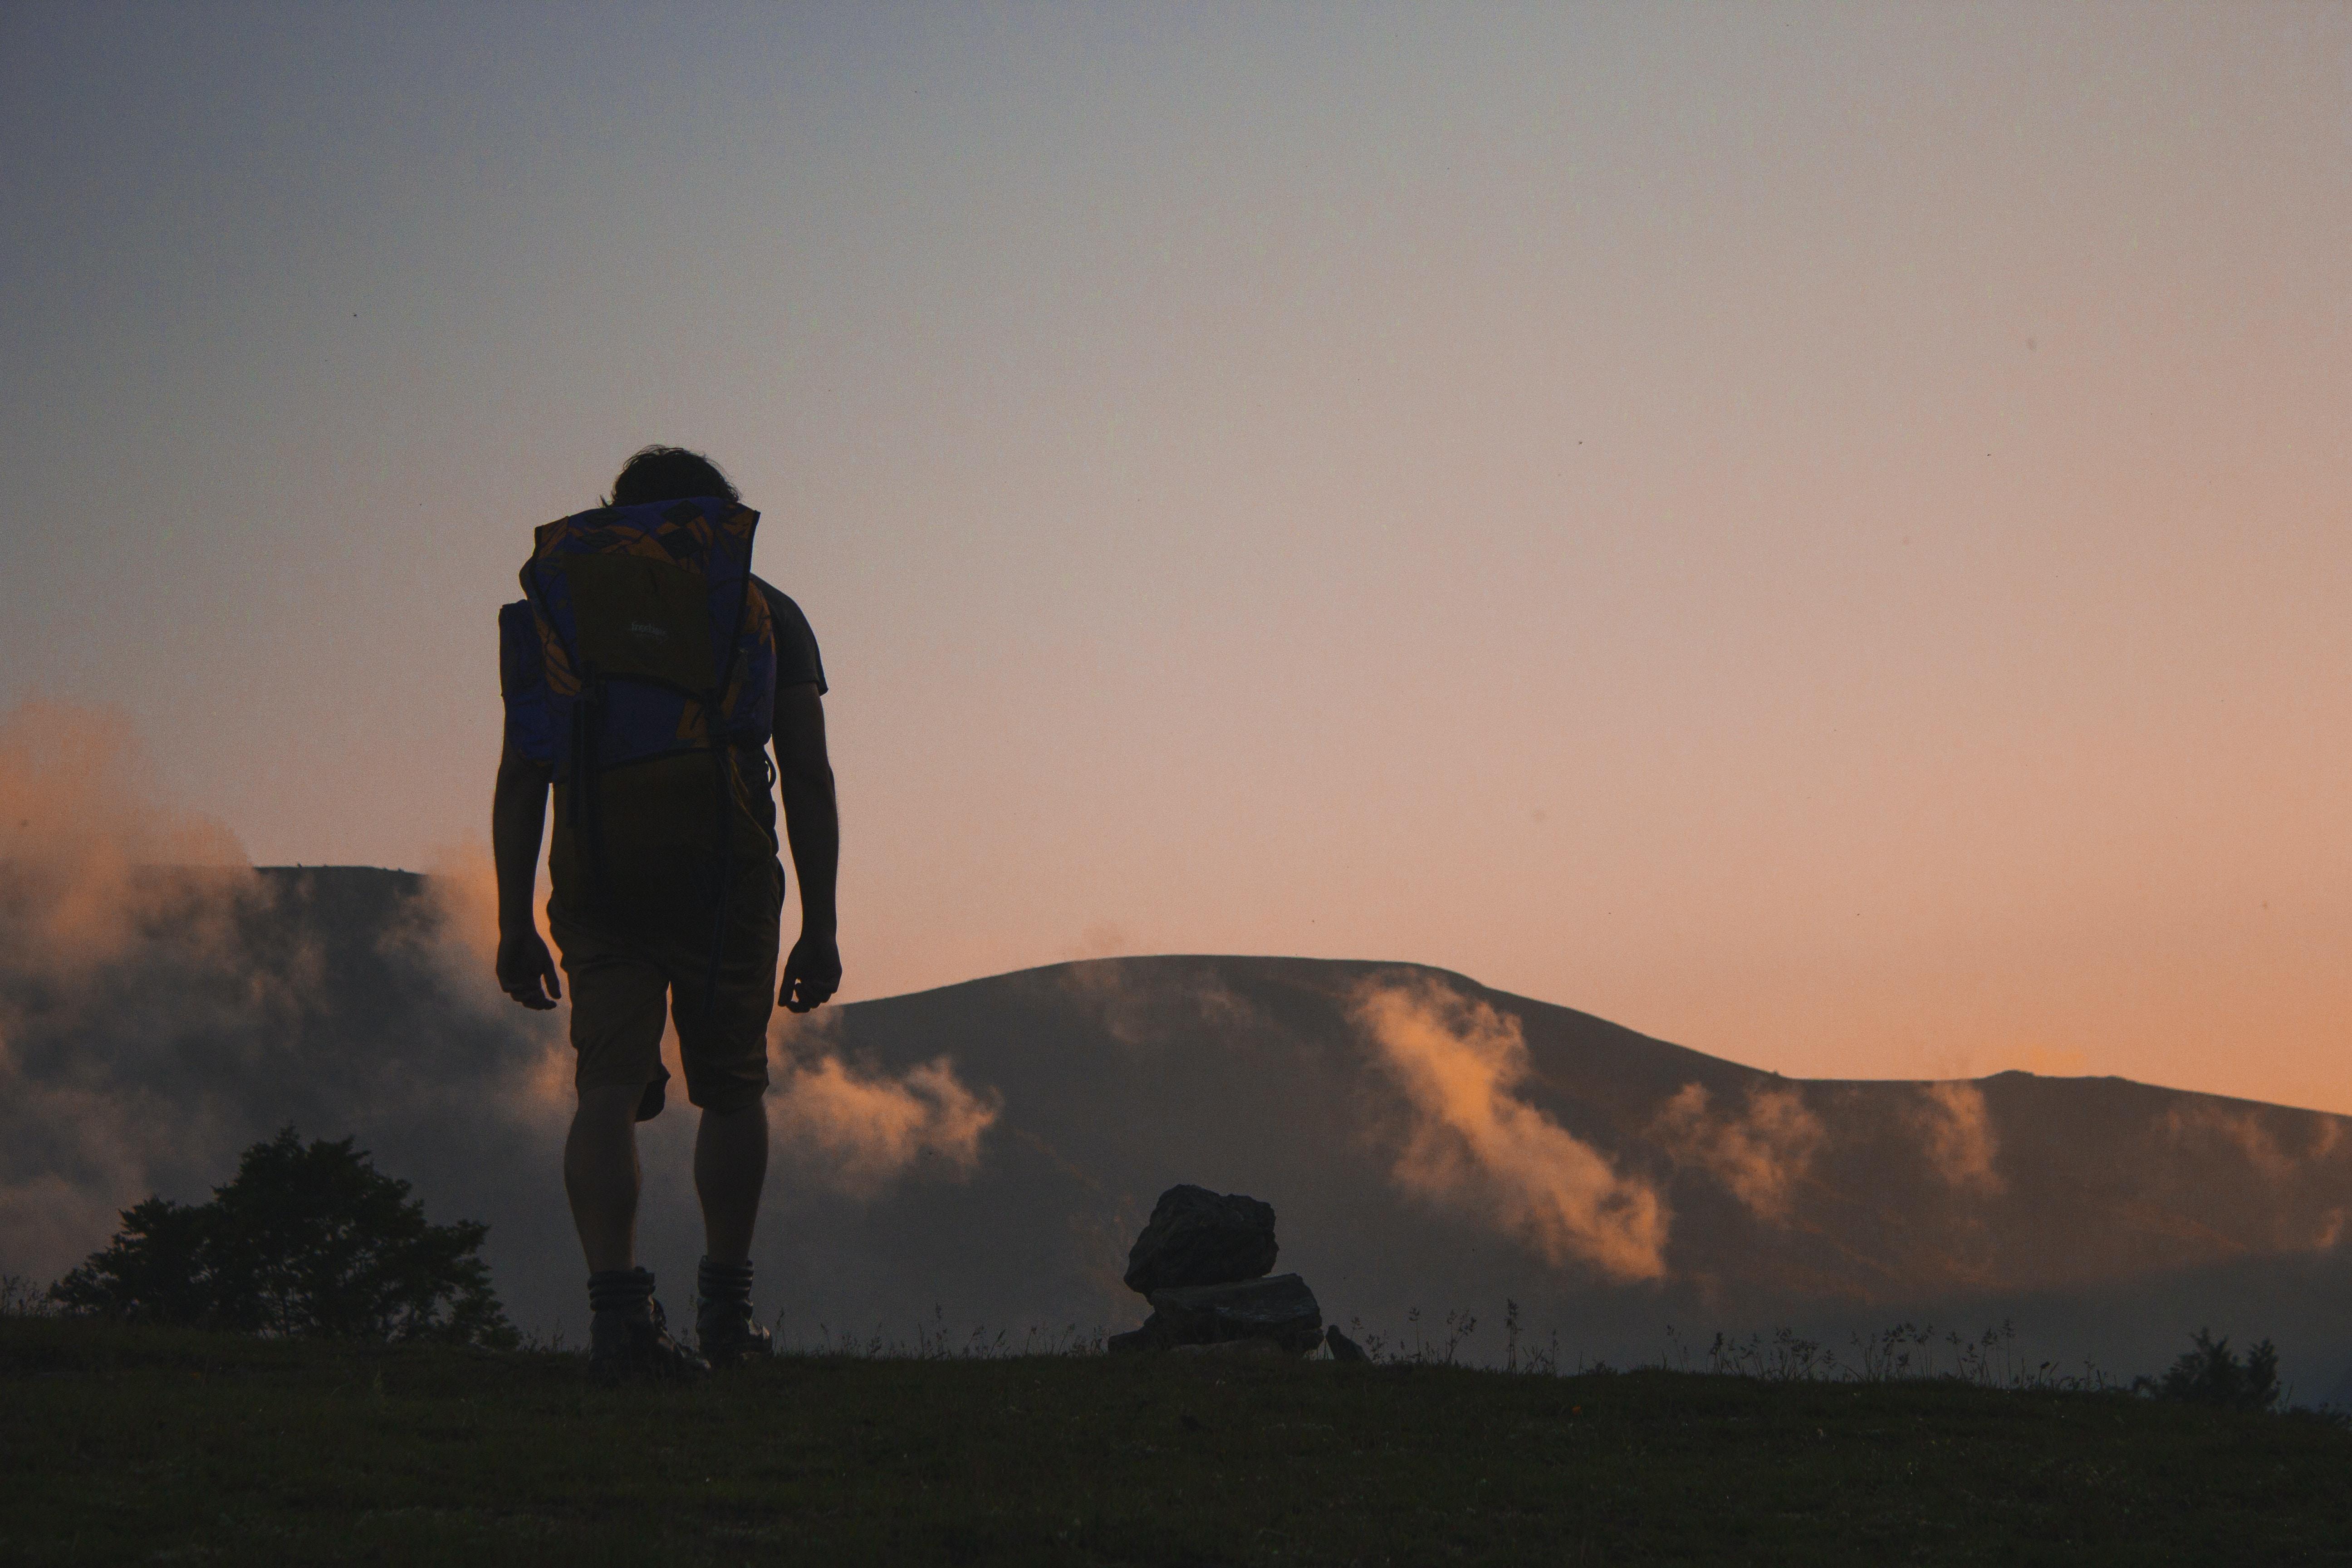 silhouette of man walking along field leading to mountain